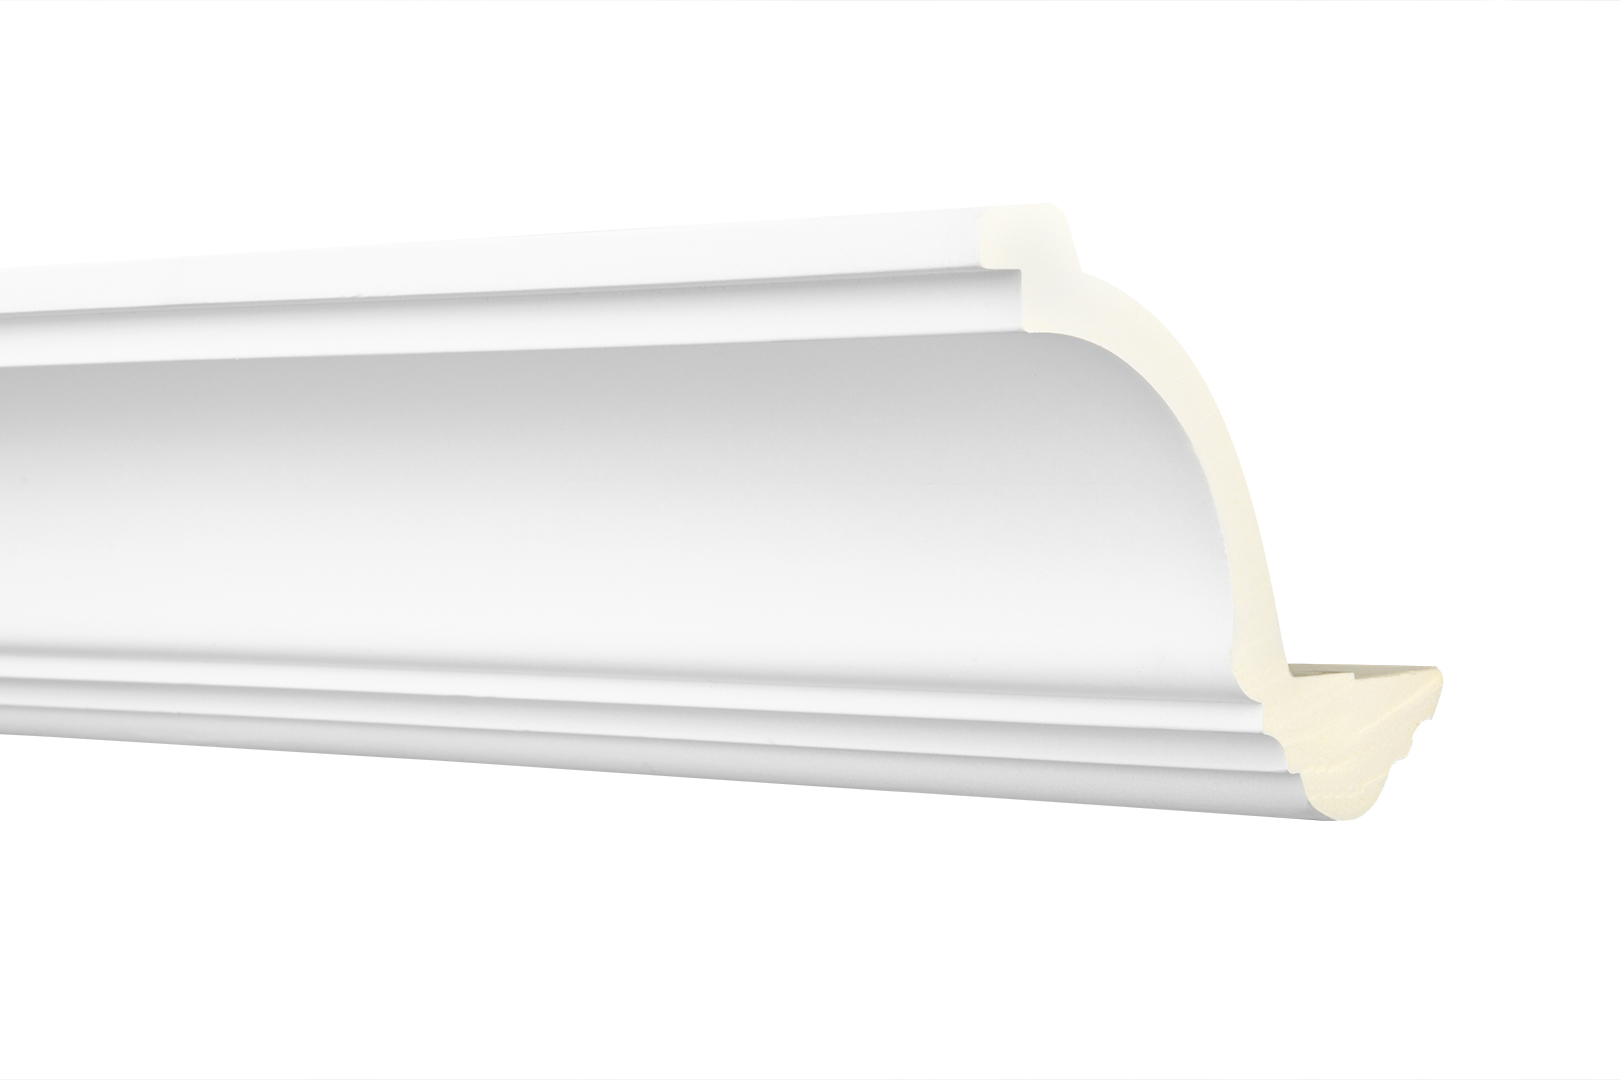 Stuckleiste | Kantenabschluss | LED Profil | PU | 128x104mm | AE003 | 2 Meter